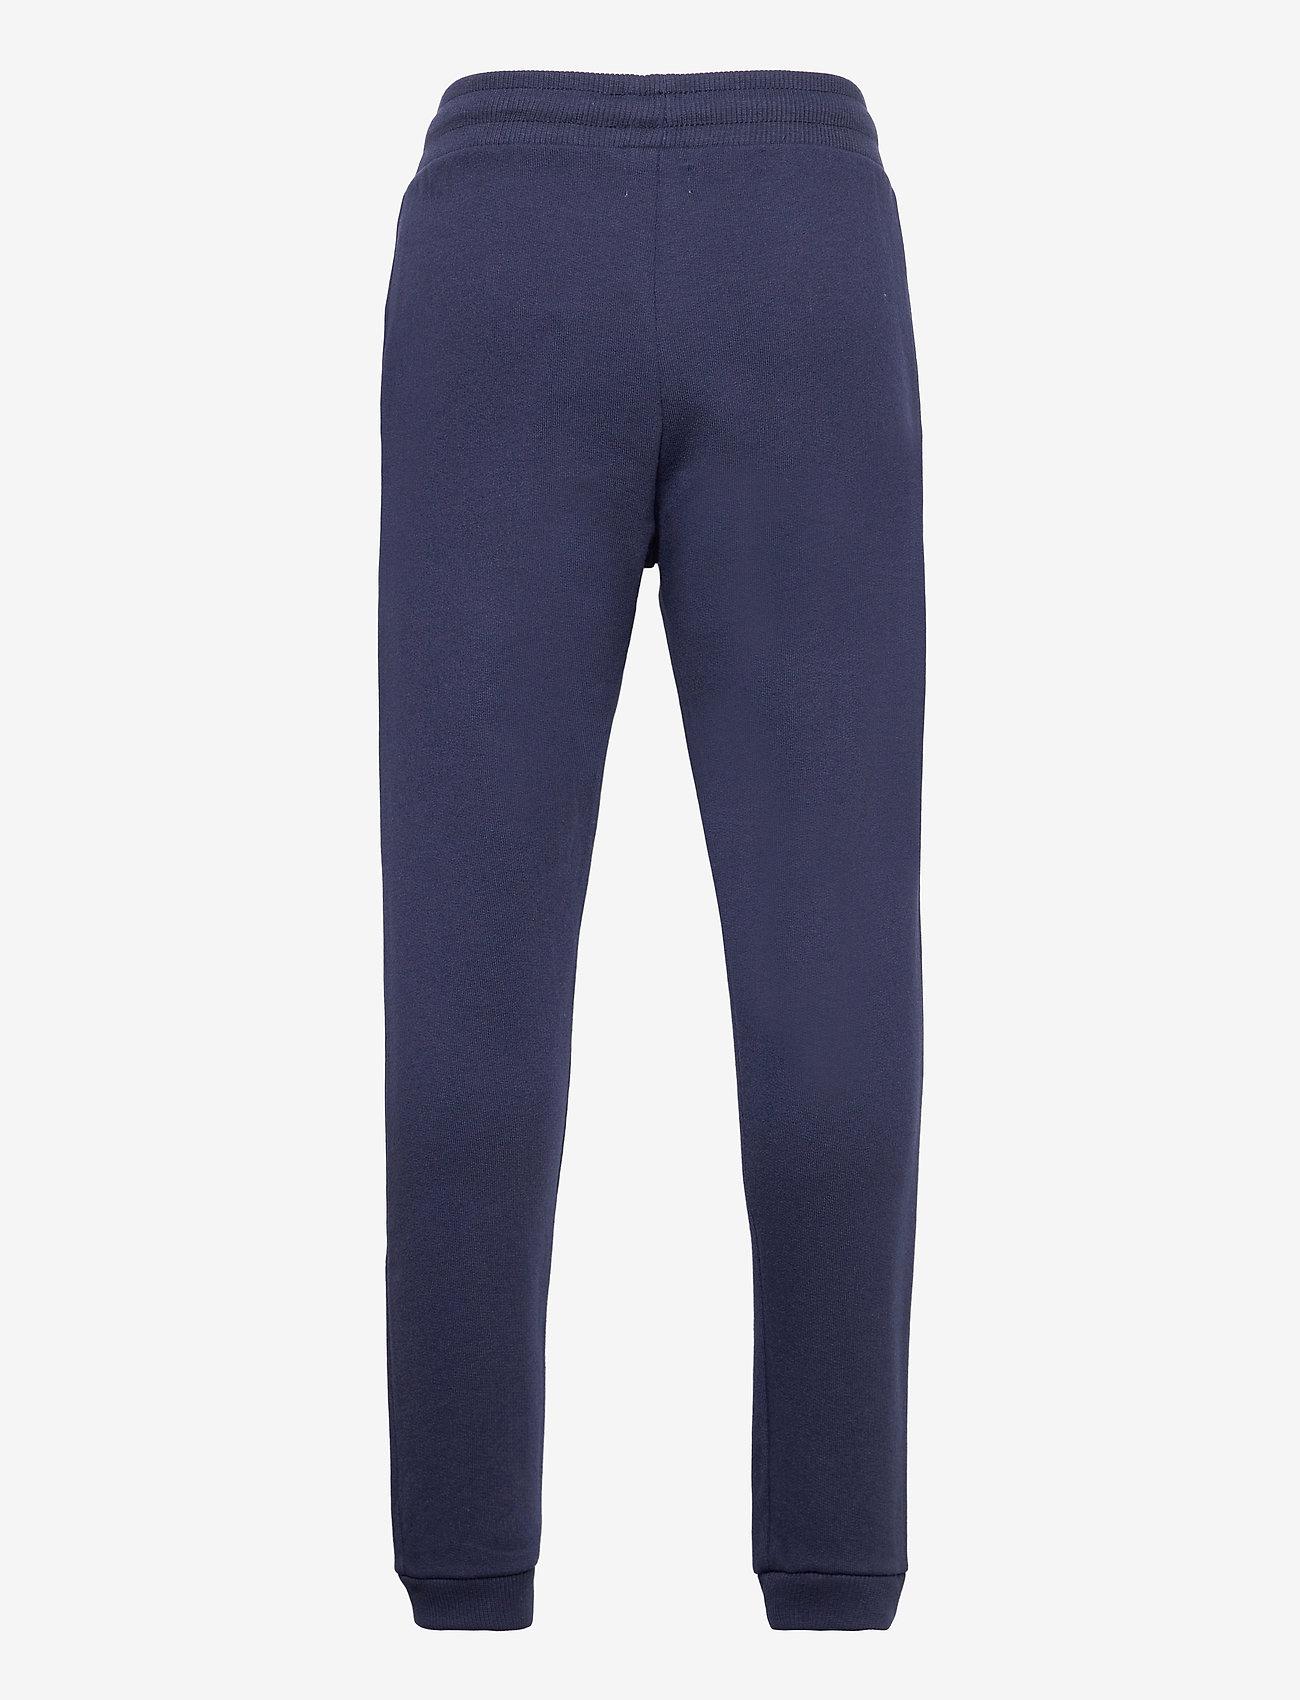 Mini A Ture - Even pants, K - sweatpants - maritime blue - 1